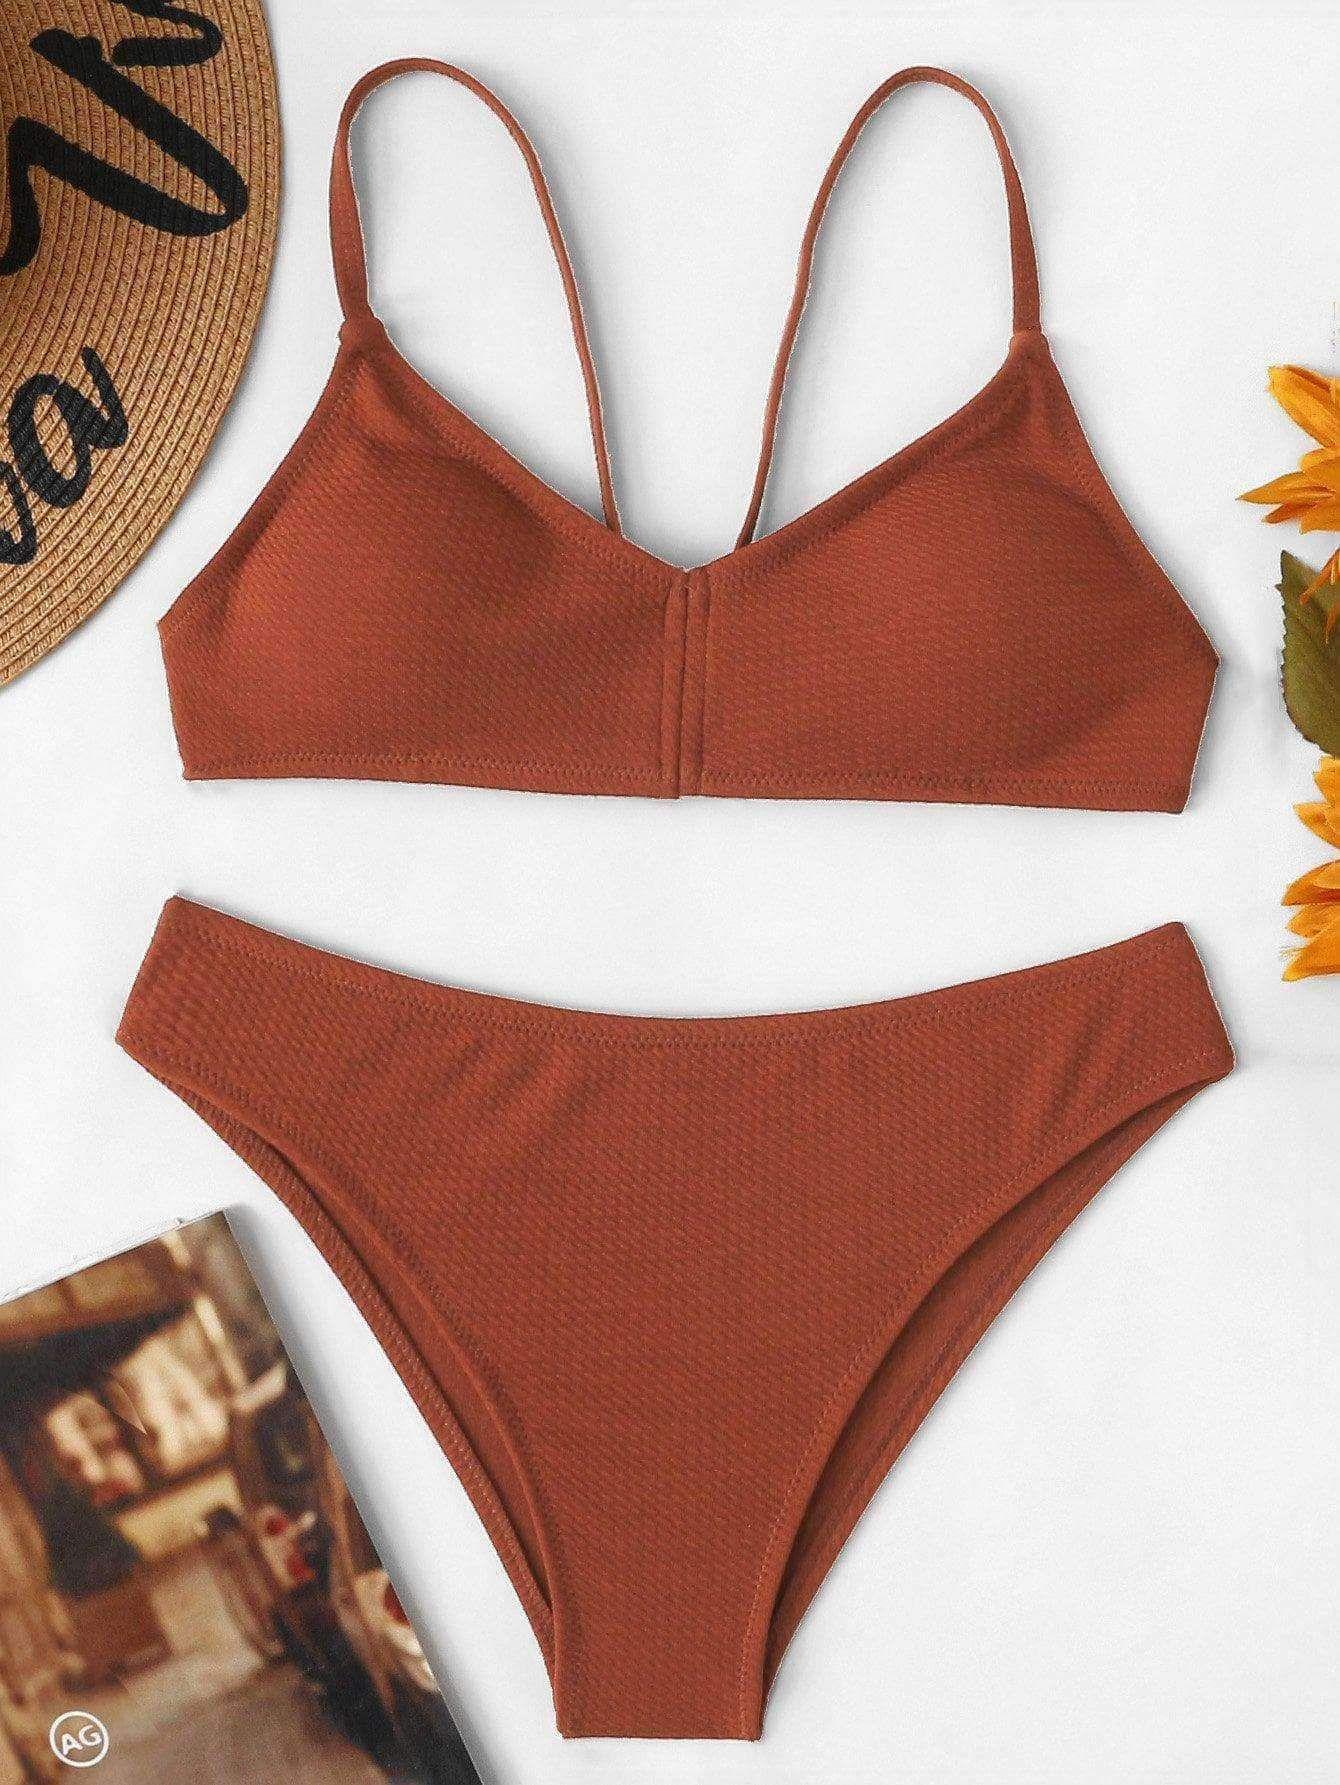 e81cf54ab5 Rust Bikini in 2019 | spring & summer style •• | Bikinis, Swimsuits ...